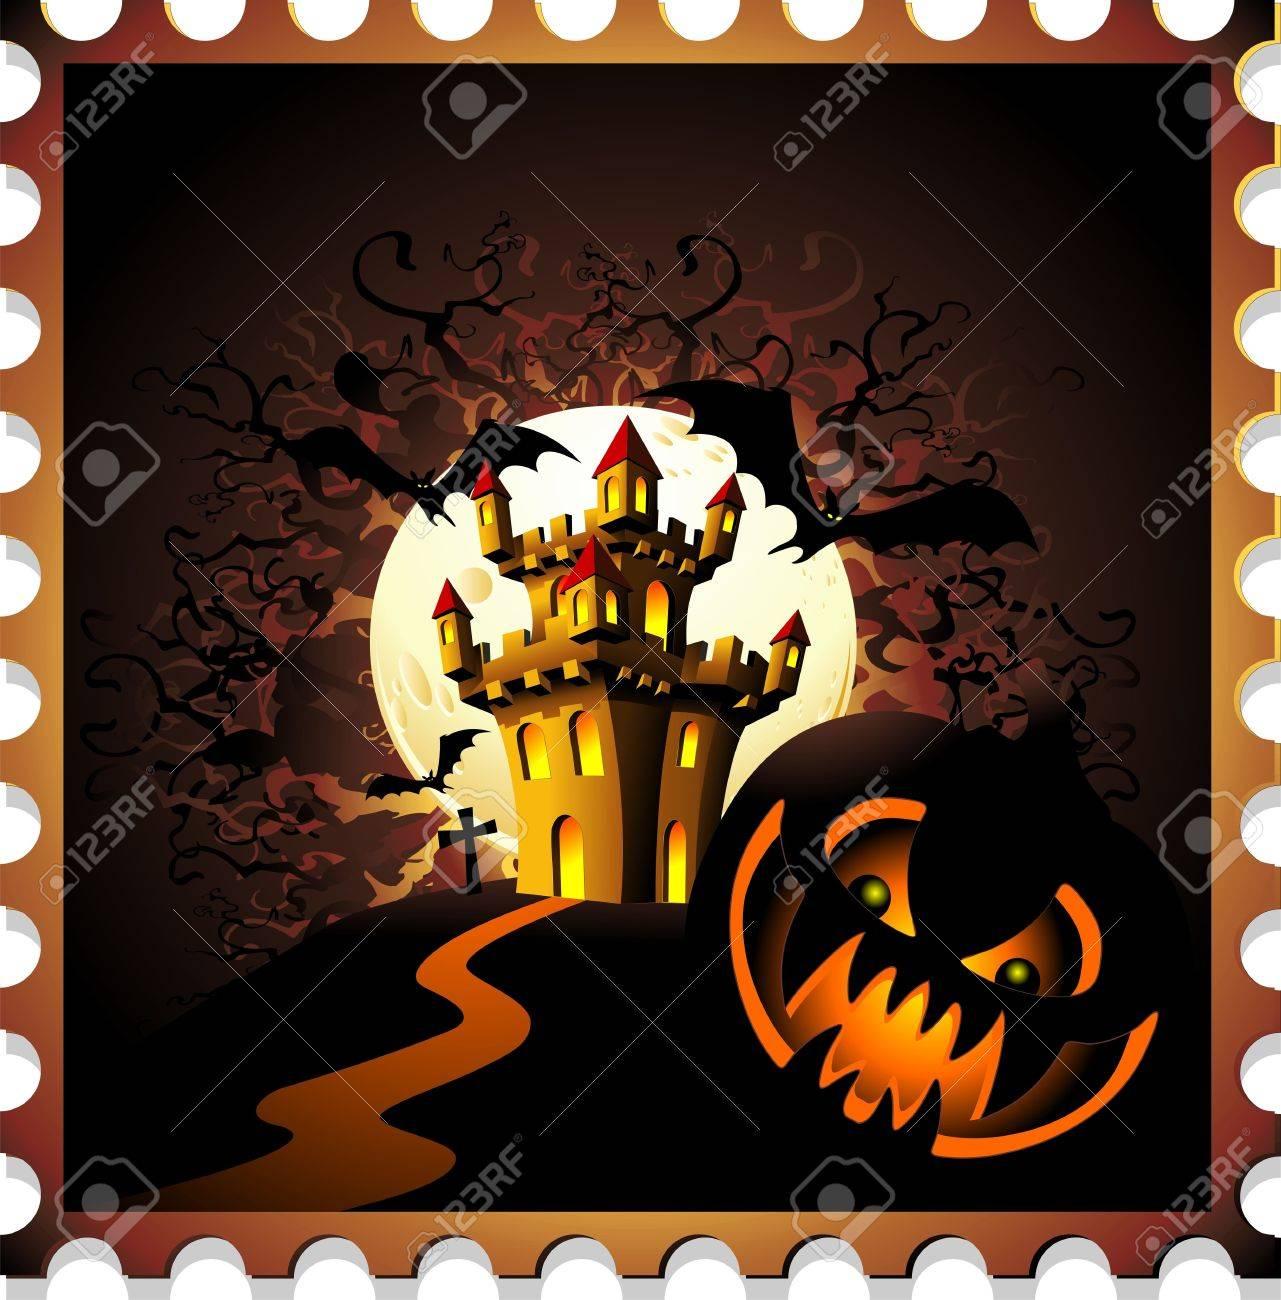 Halloween Pumpkin and Castle Stamp Background Stock Vector - 10594724